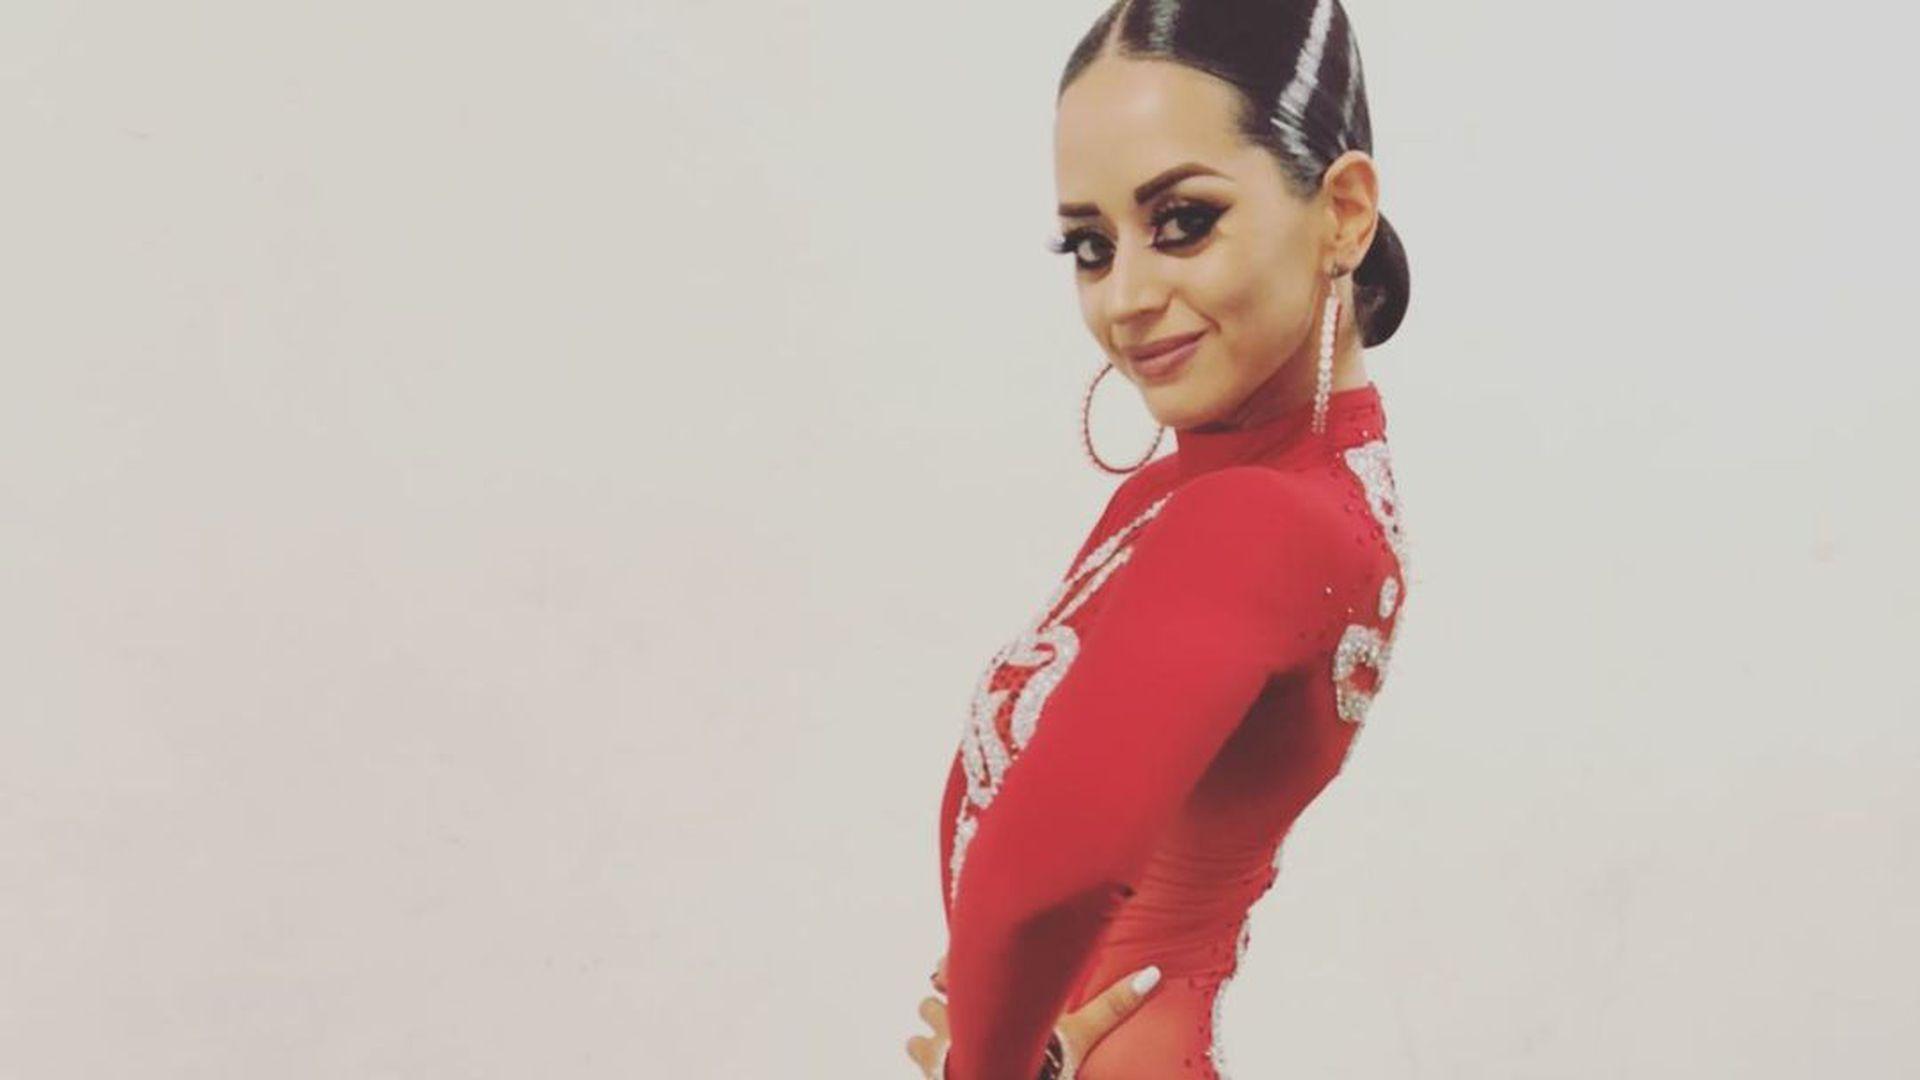 So Aufgeregt Ist Profi Malika Vor Erster Let S Dance Show Promiflash De